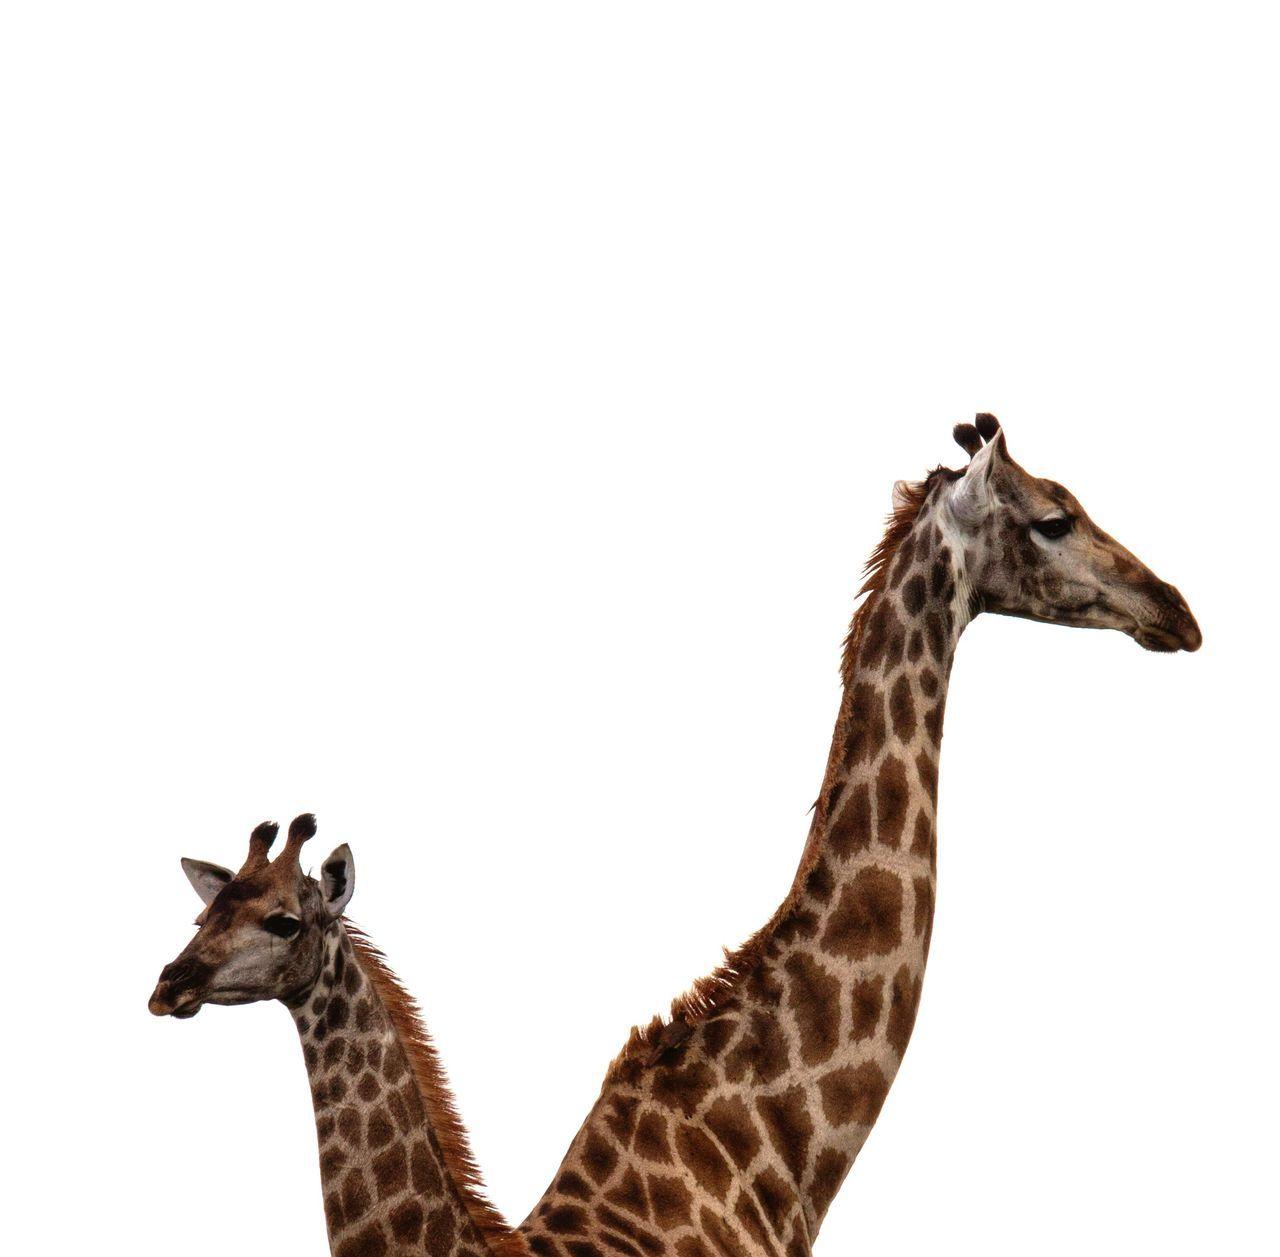 Criss Cross Giraffe Animal Themes Animals In The Wild Giraffe Animal Neck Clear Sky Nature No People Animal Markings Safari Animals Outdoors Kruger Park South Africa Safari Animal Wildlife Cross Counterparts Yingyang Balance Symmetry